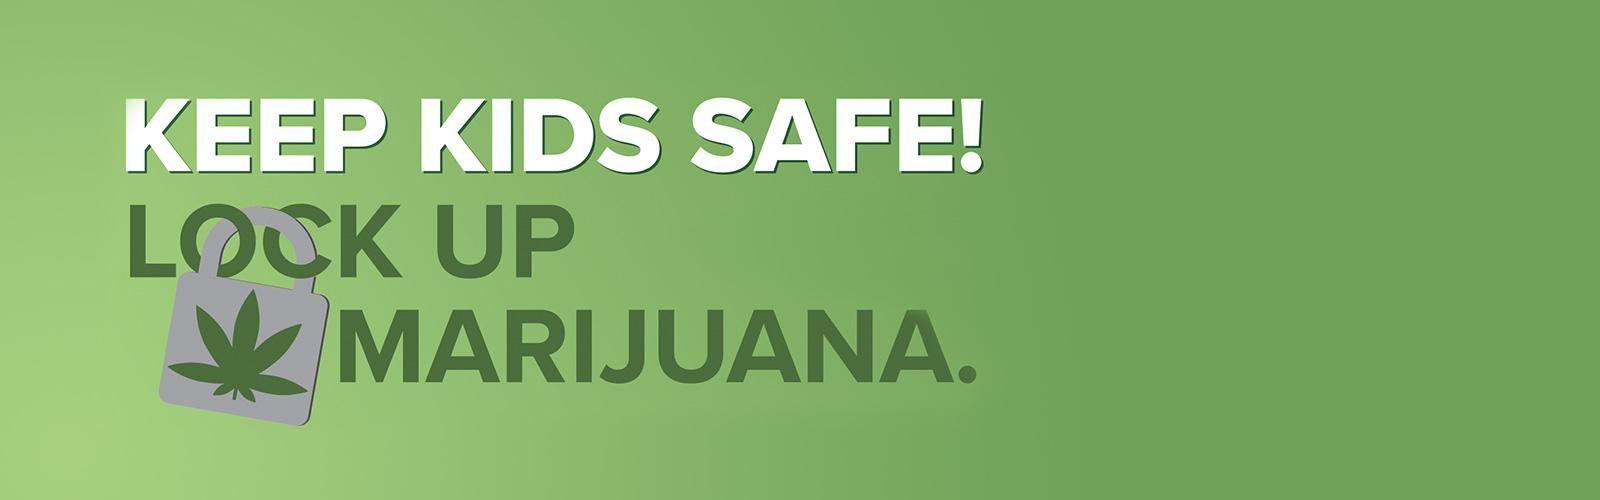 marijuana header - Marijuana